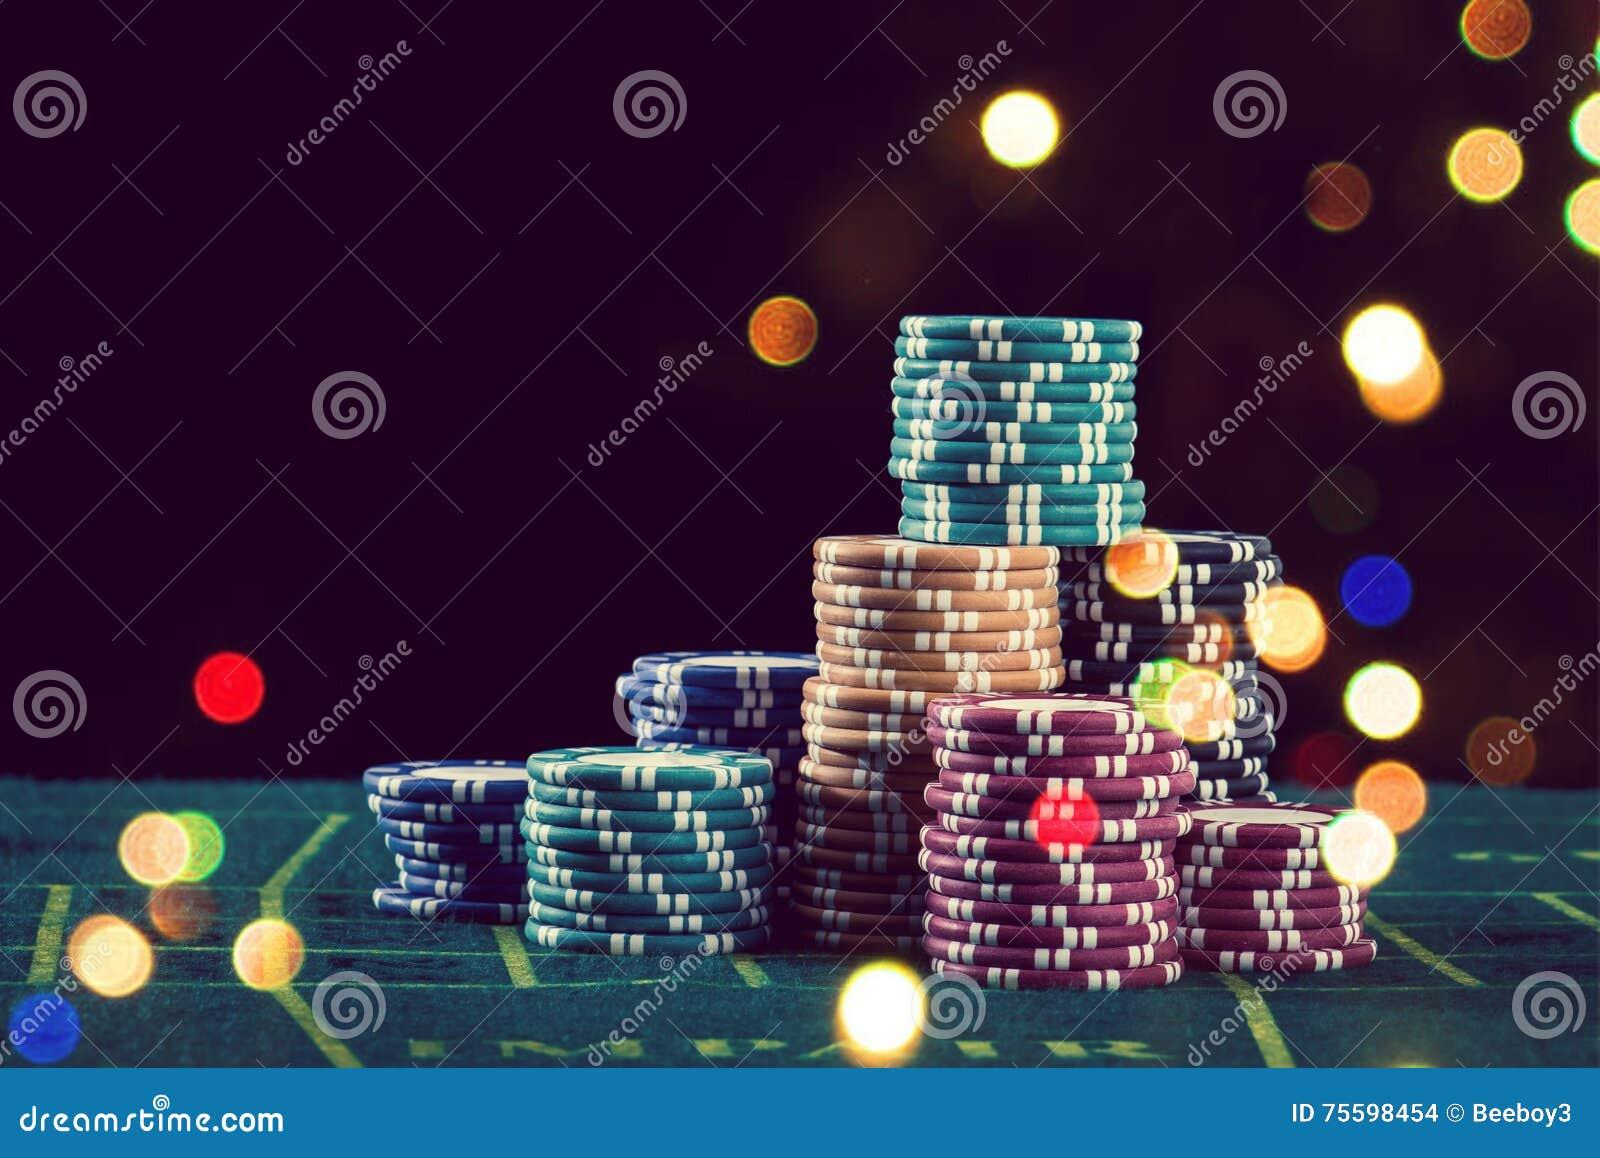 Casinobeeld